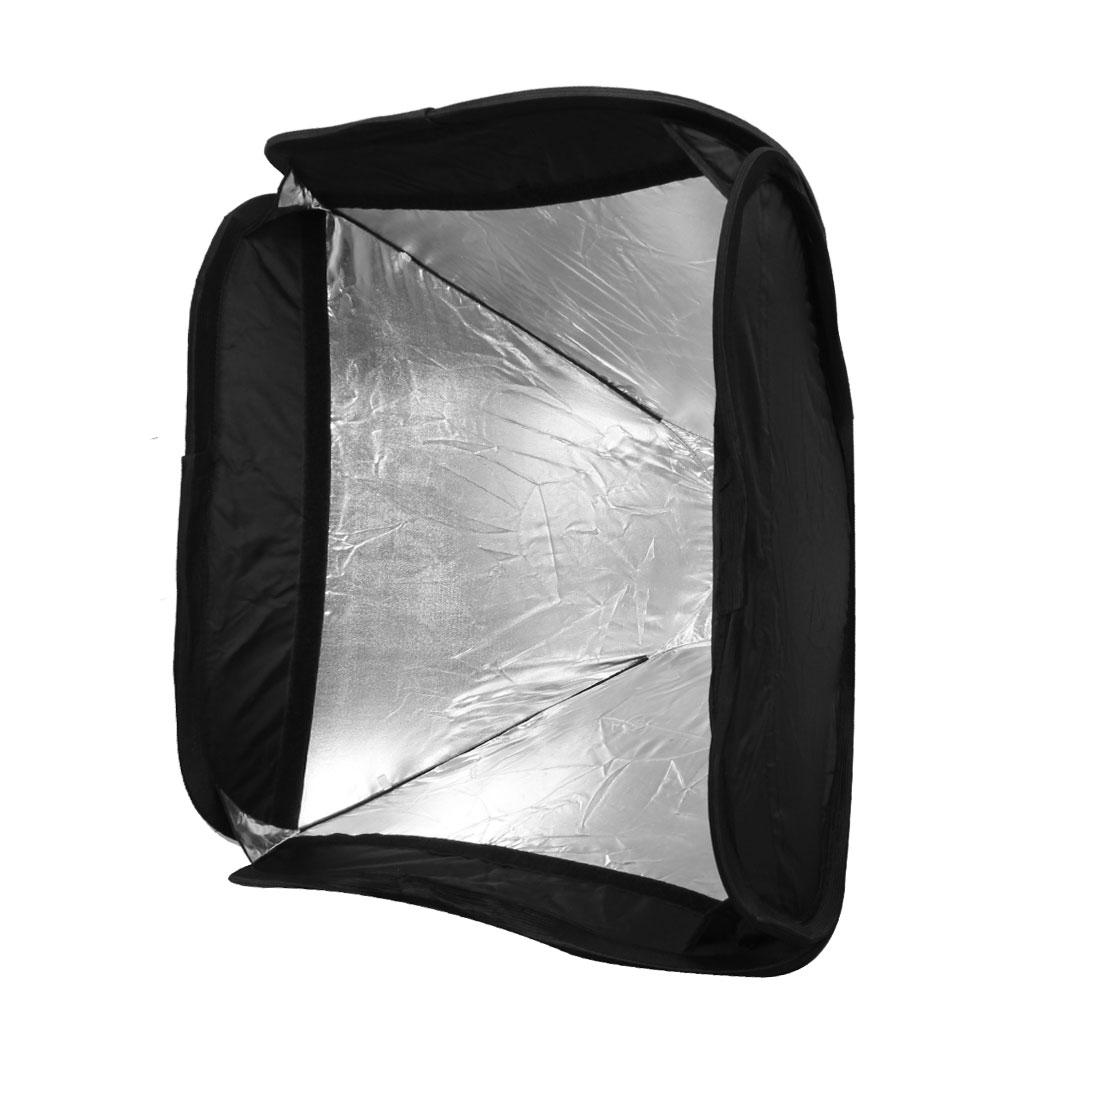 Black Flash Soft Box Diffuser 50cm x 50cm for Digital SLR Camera